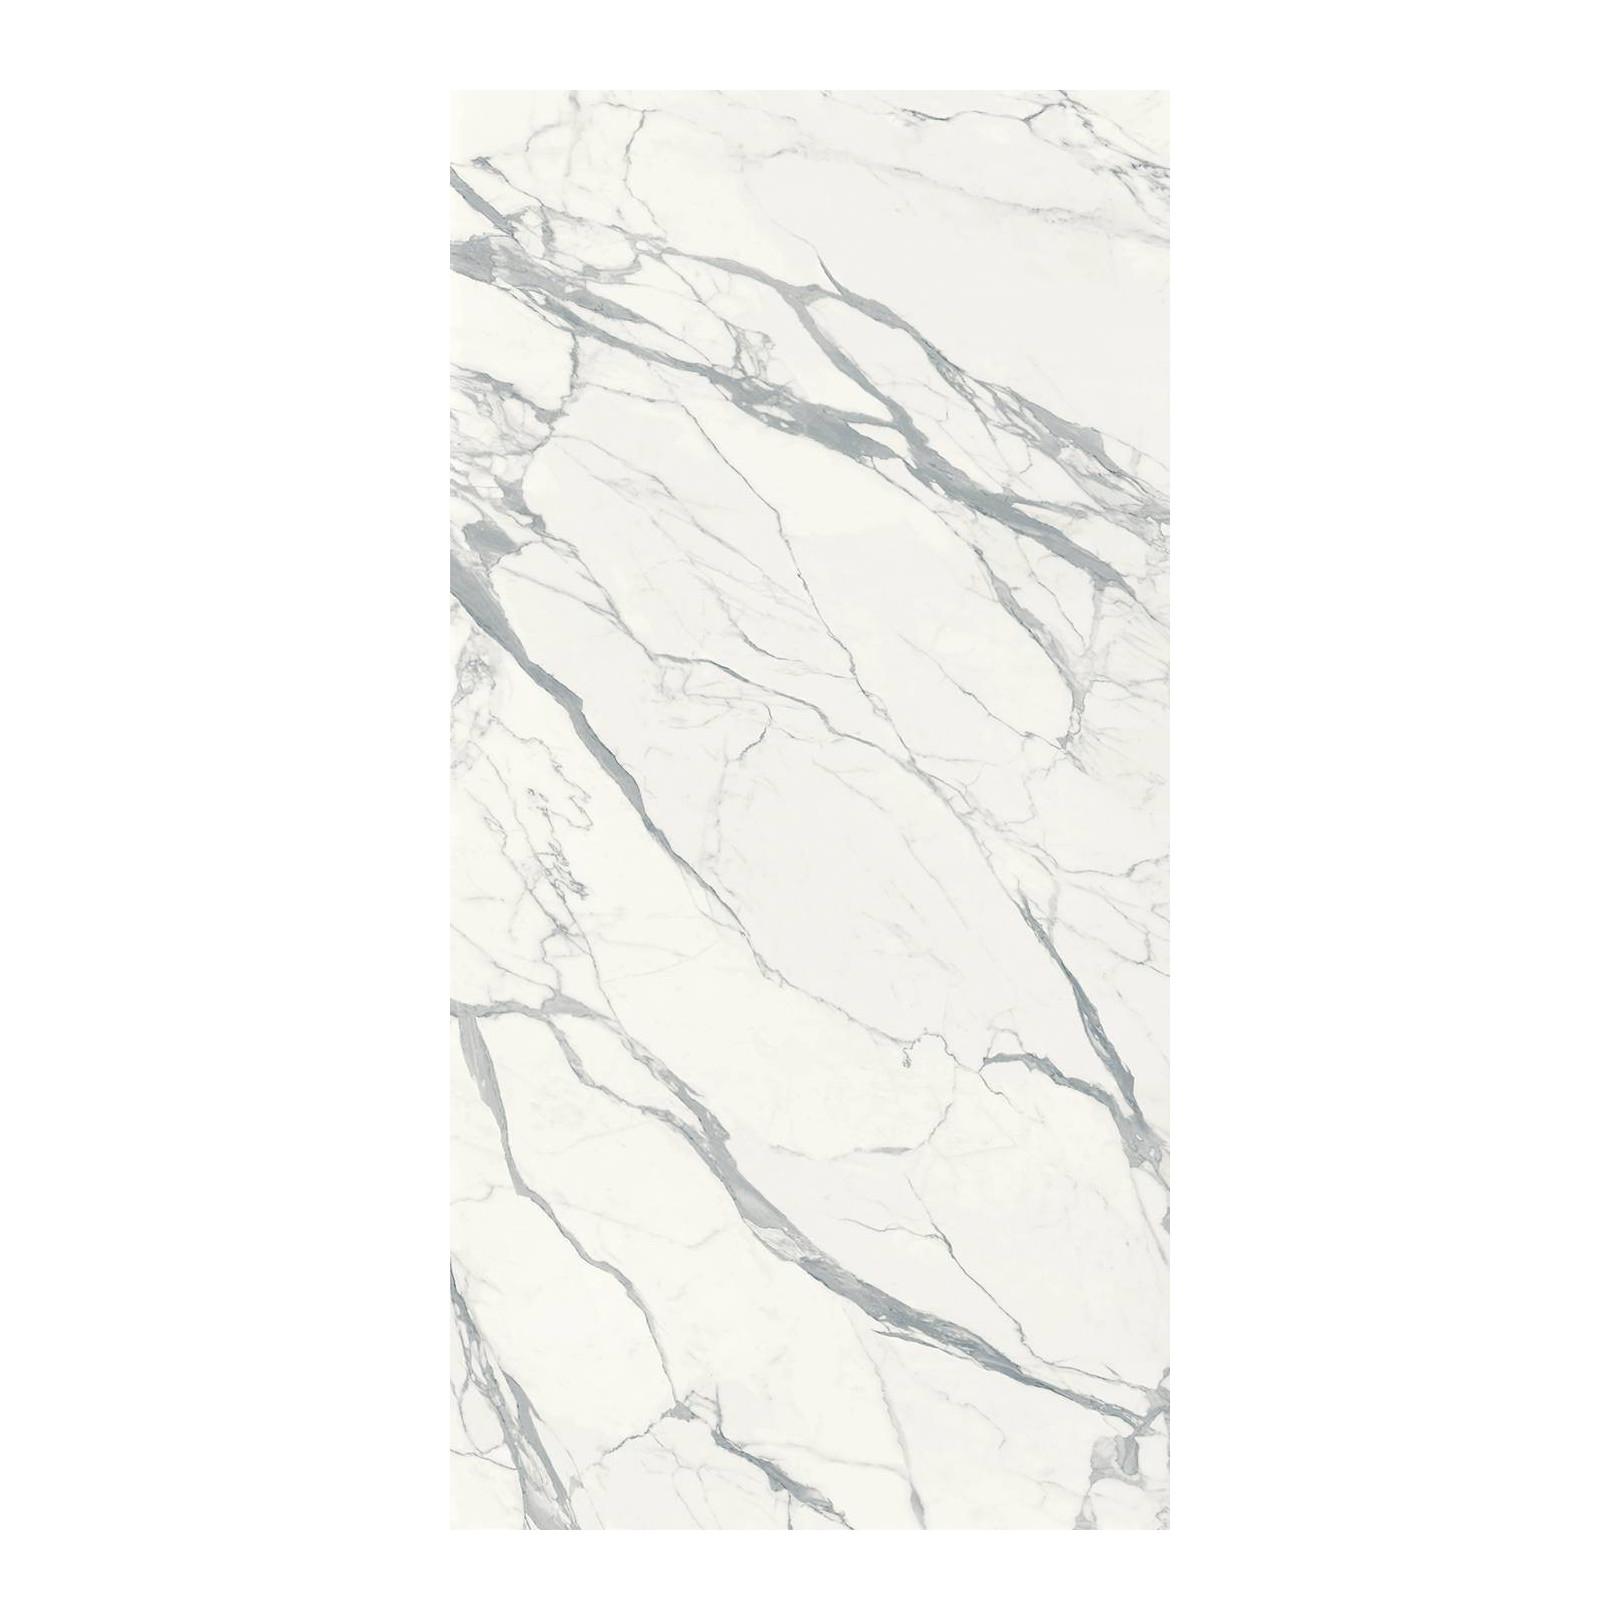 Carrelage grès cérame effet marbre Infinito 2.0 Statuario Extra (4 formats, 2 finitions)